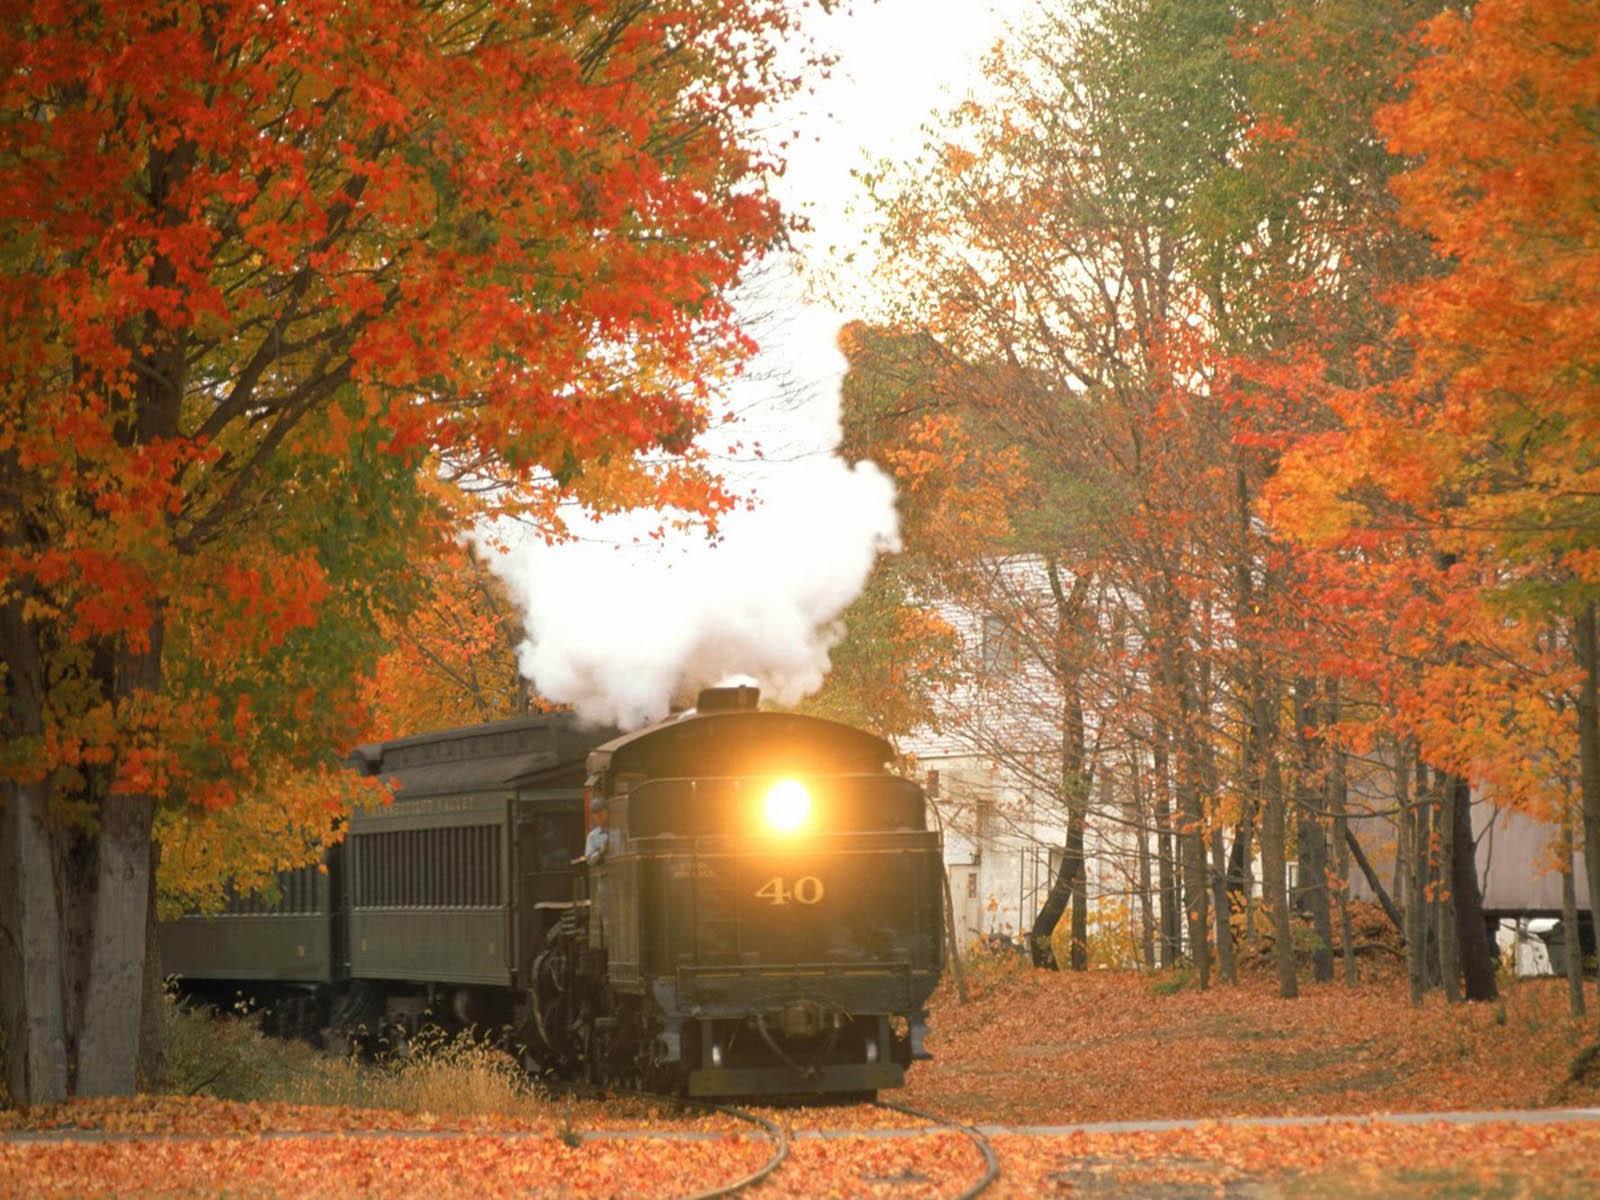 Gambar Kereta Api dengan Pemandangan Indah  Gambar Keren